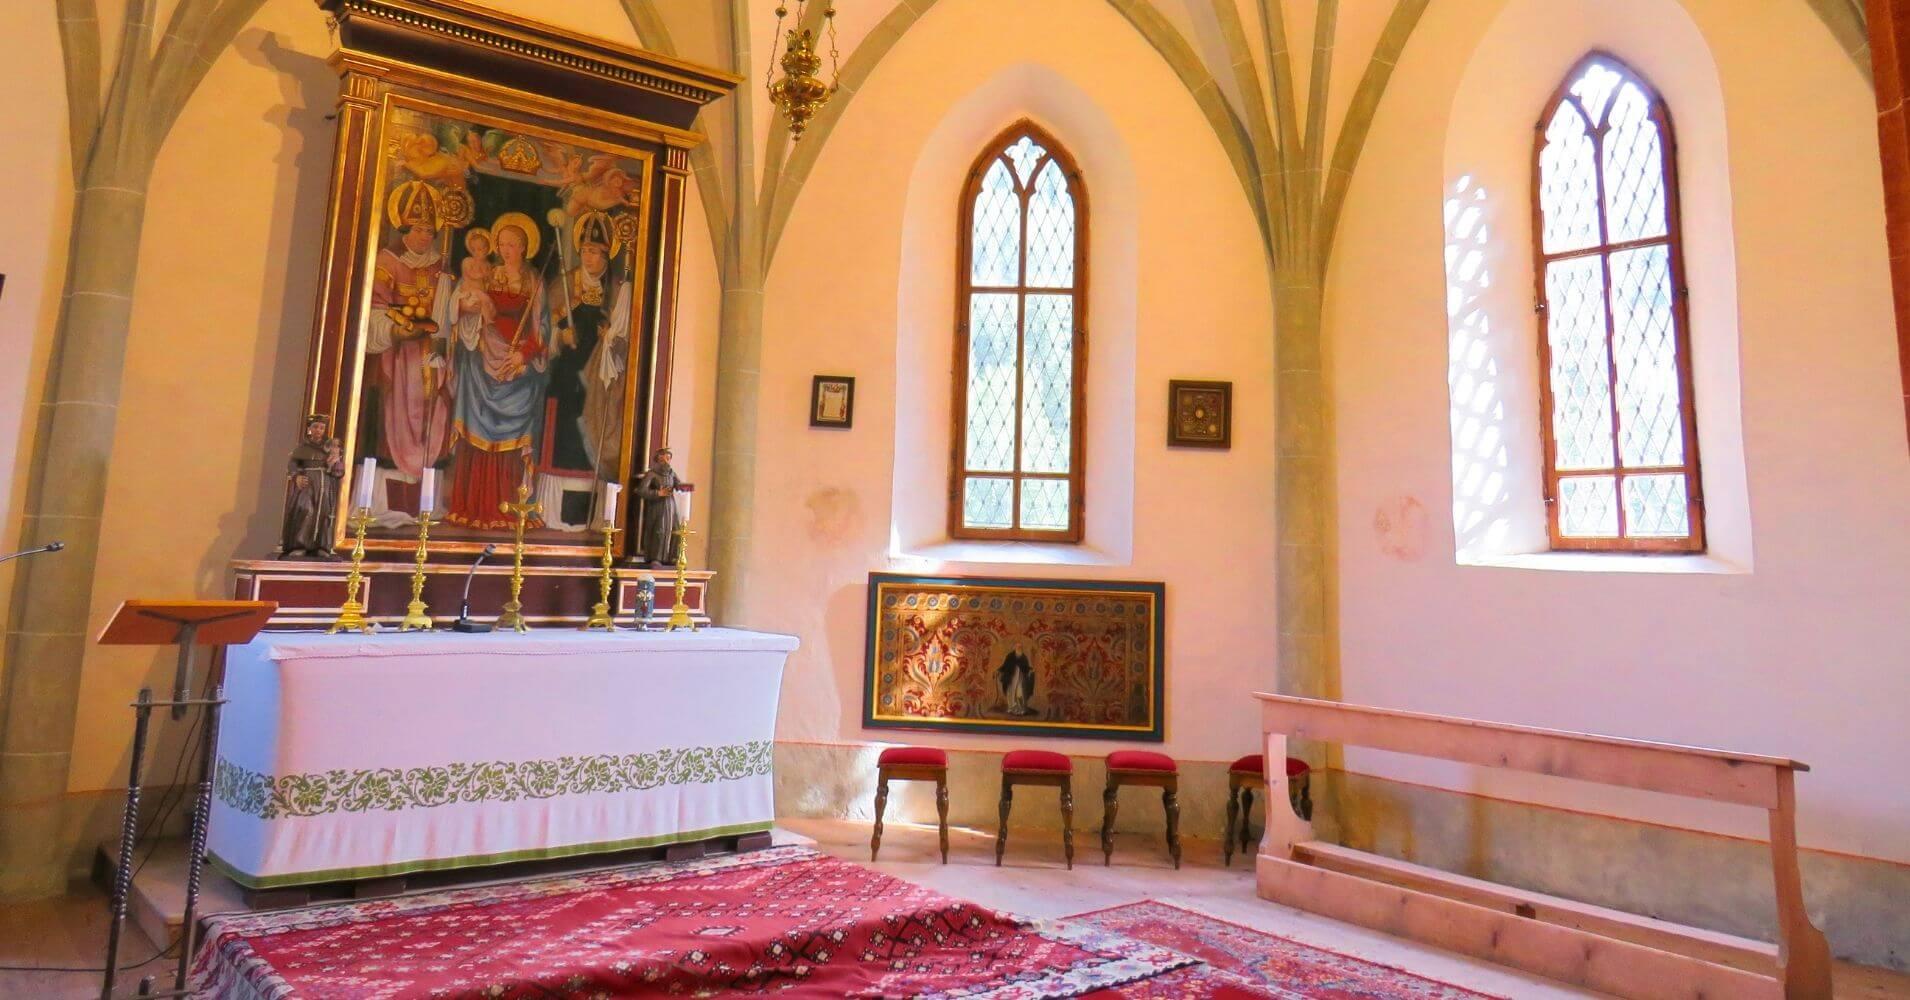 Refugio e Iglesia de Ospitale, Cortina d' Ampezo. Véneto en Italia.